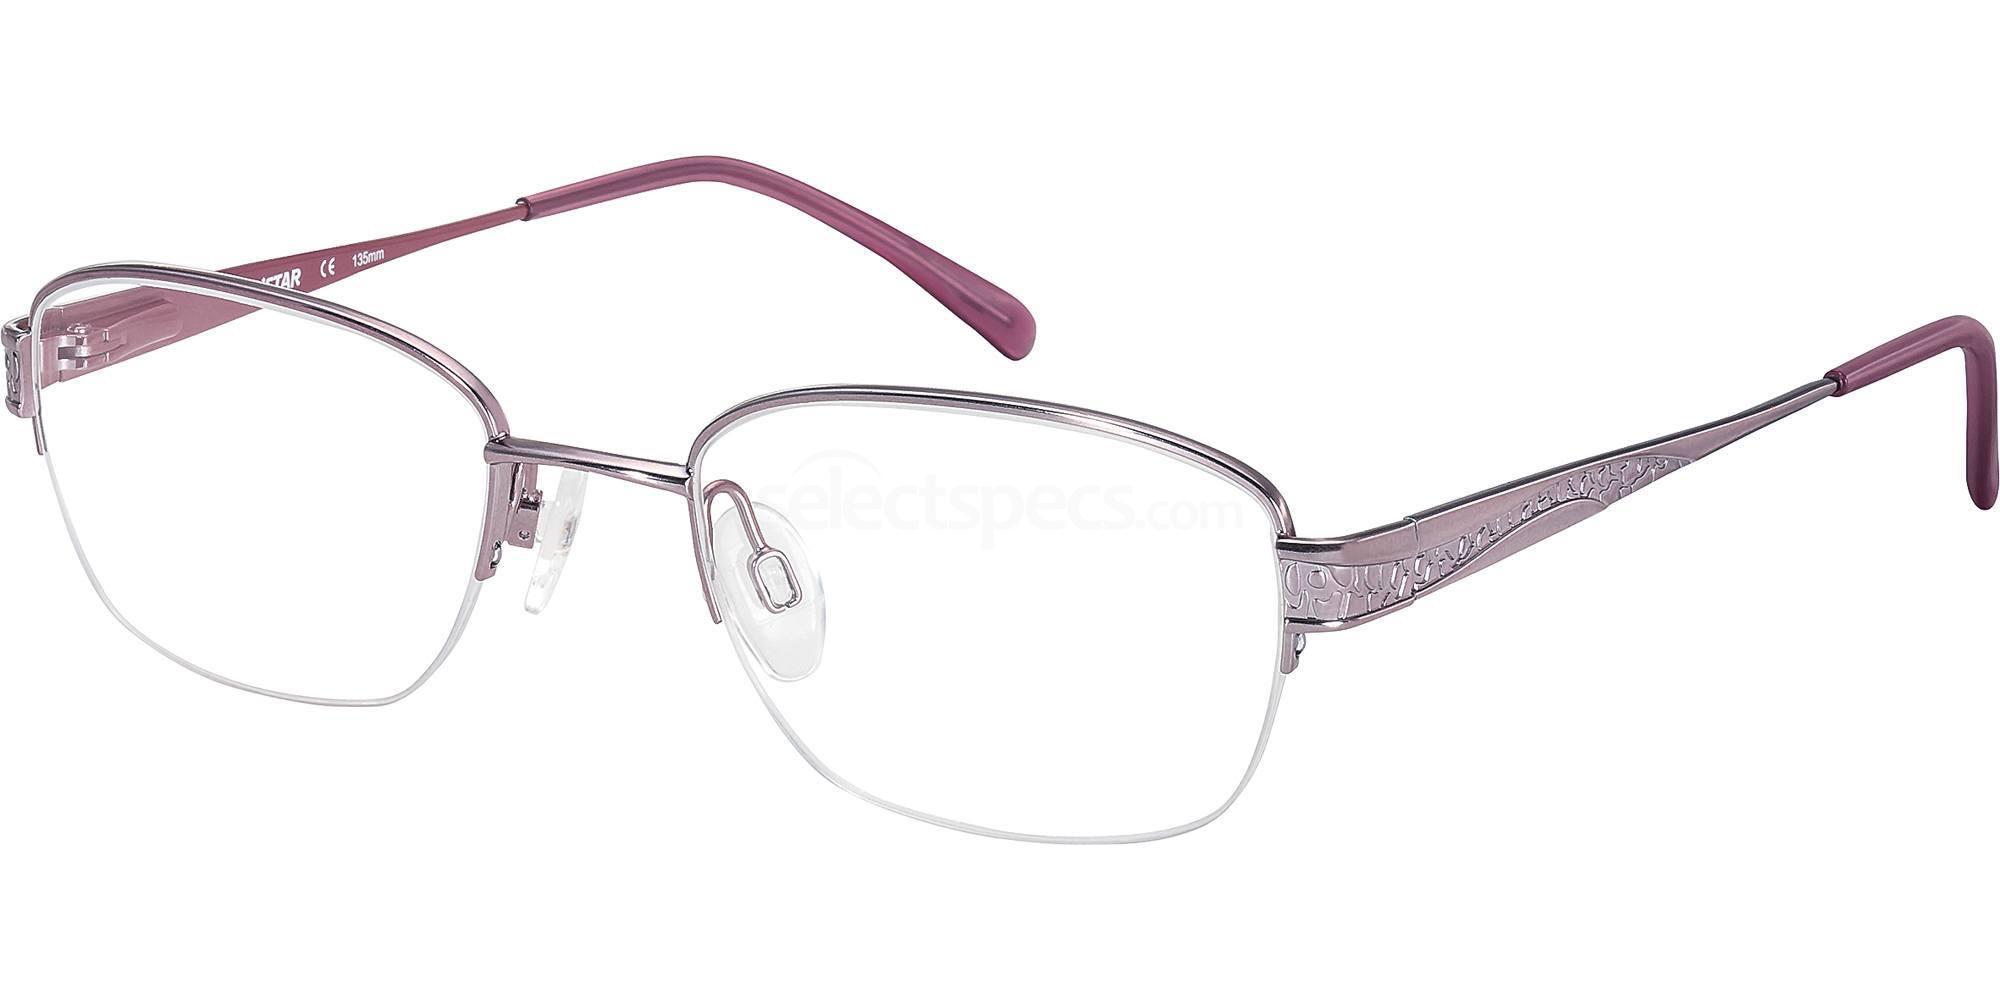 534 AR16352 Glasses, Aristar